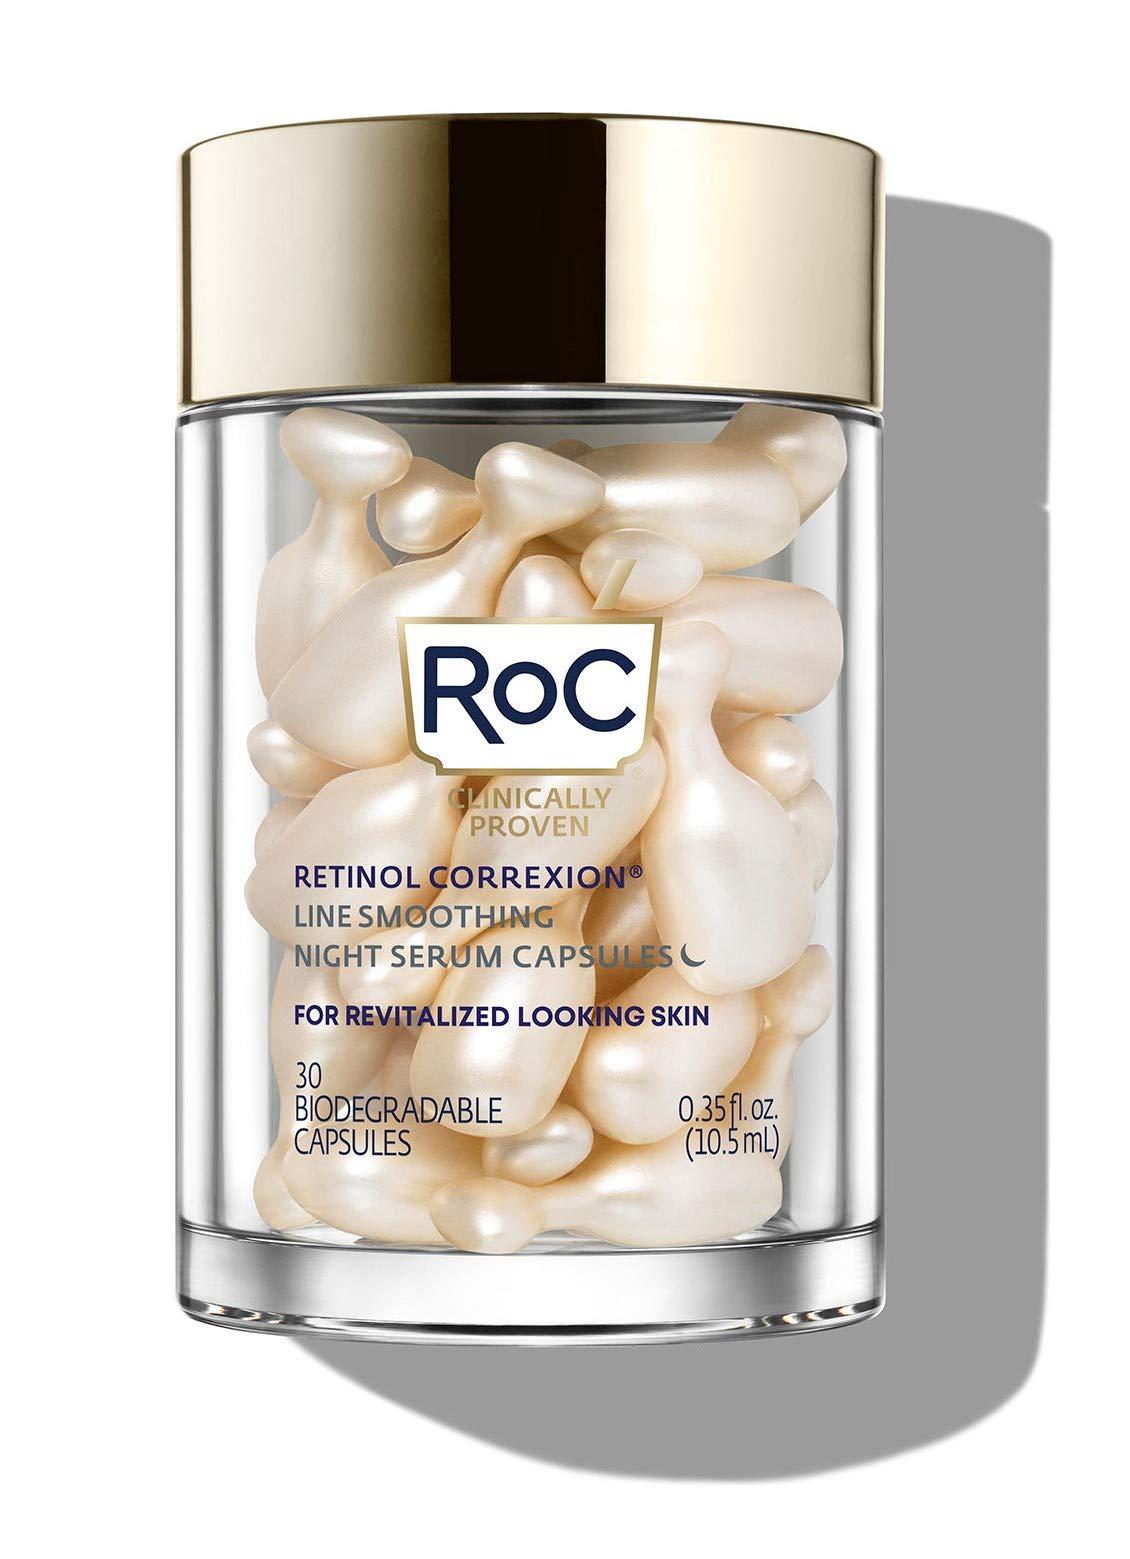 RoC Retinol Correxion Line Smoothing Night Retinol Serum 30 Capsules, unscented, 0.35 Fl Oz